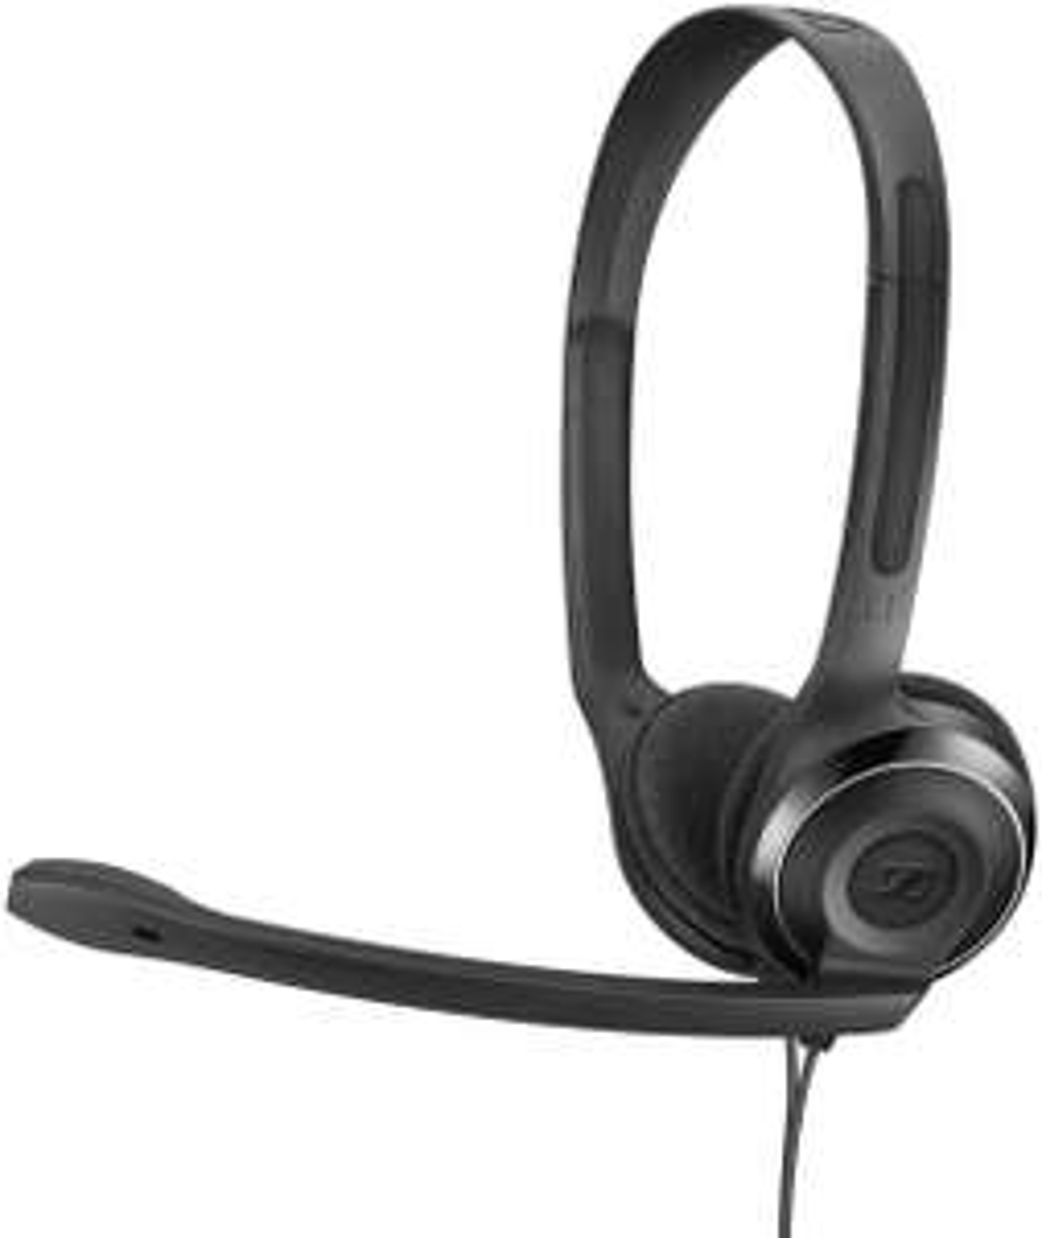 Sennheiser PC 8 USB Internet Telephony On-Ear Headset - Black - £20.40 @ Amazon